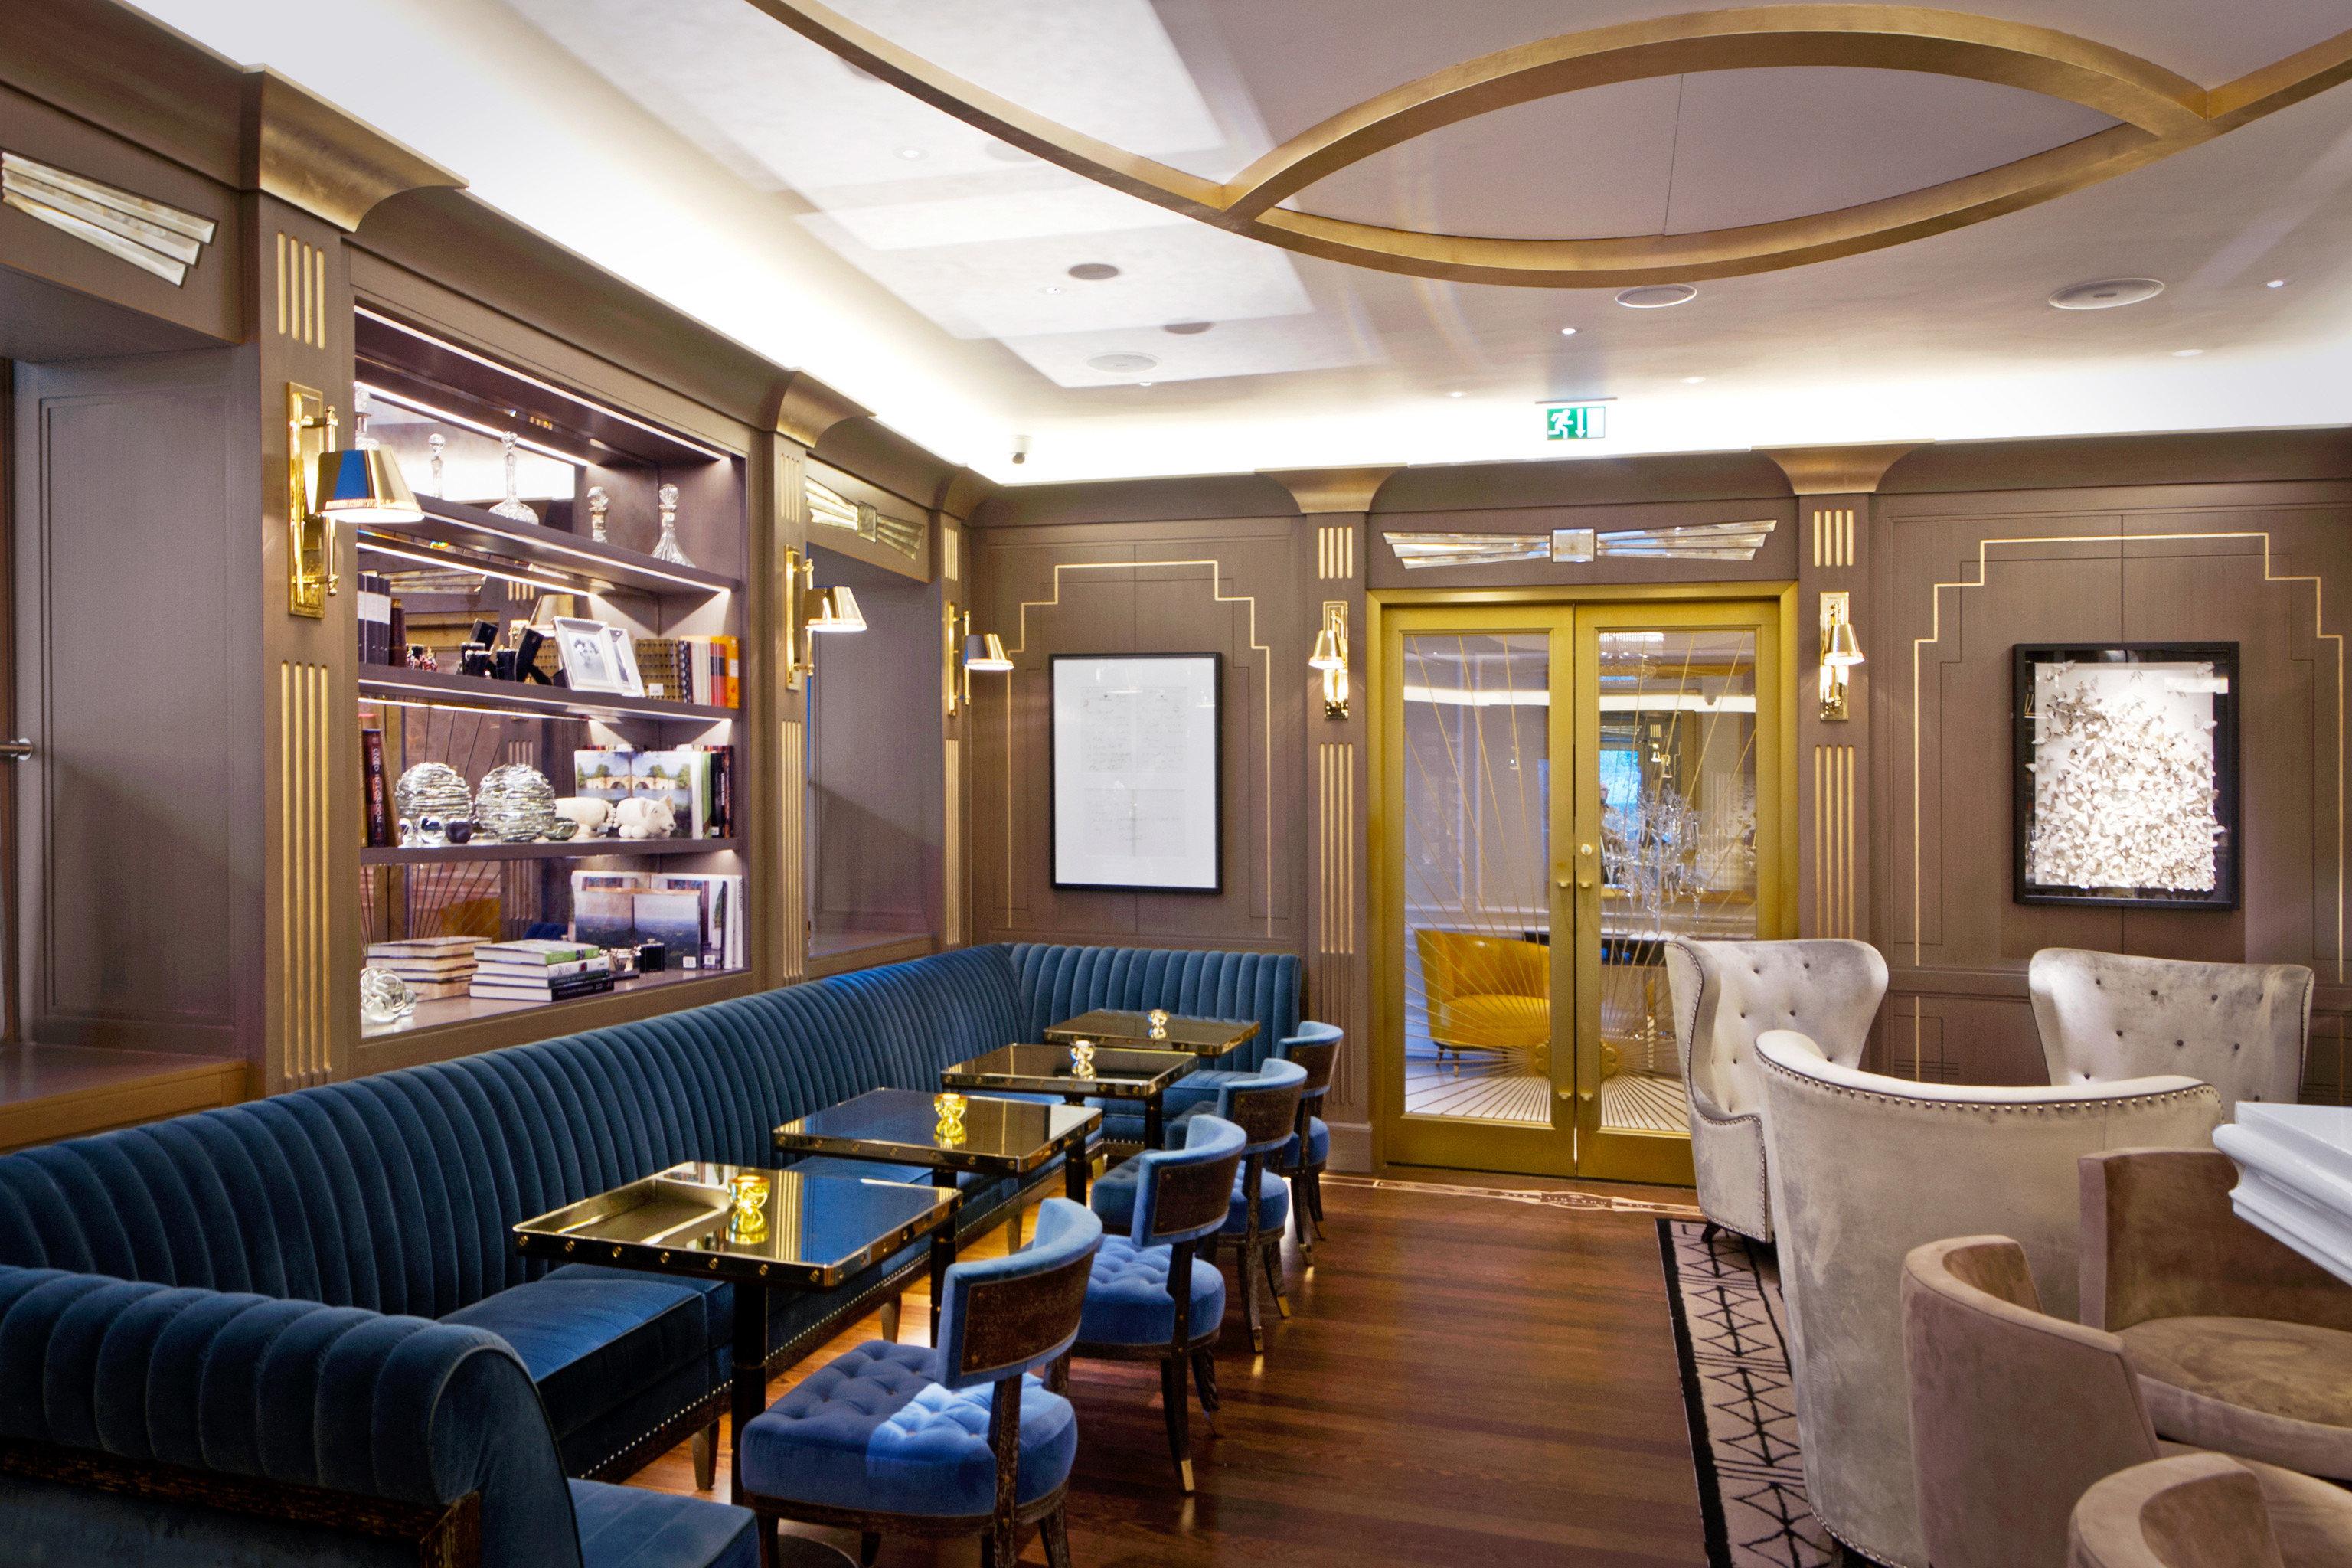 Bar Dining Drink Eat Luxury Modern vehicle yacht restaurant passenger ship Lobby